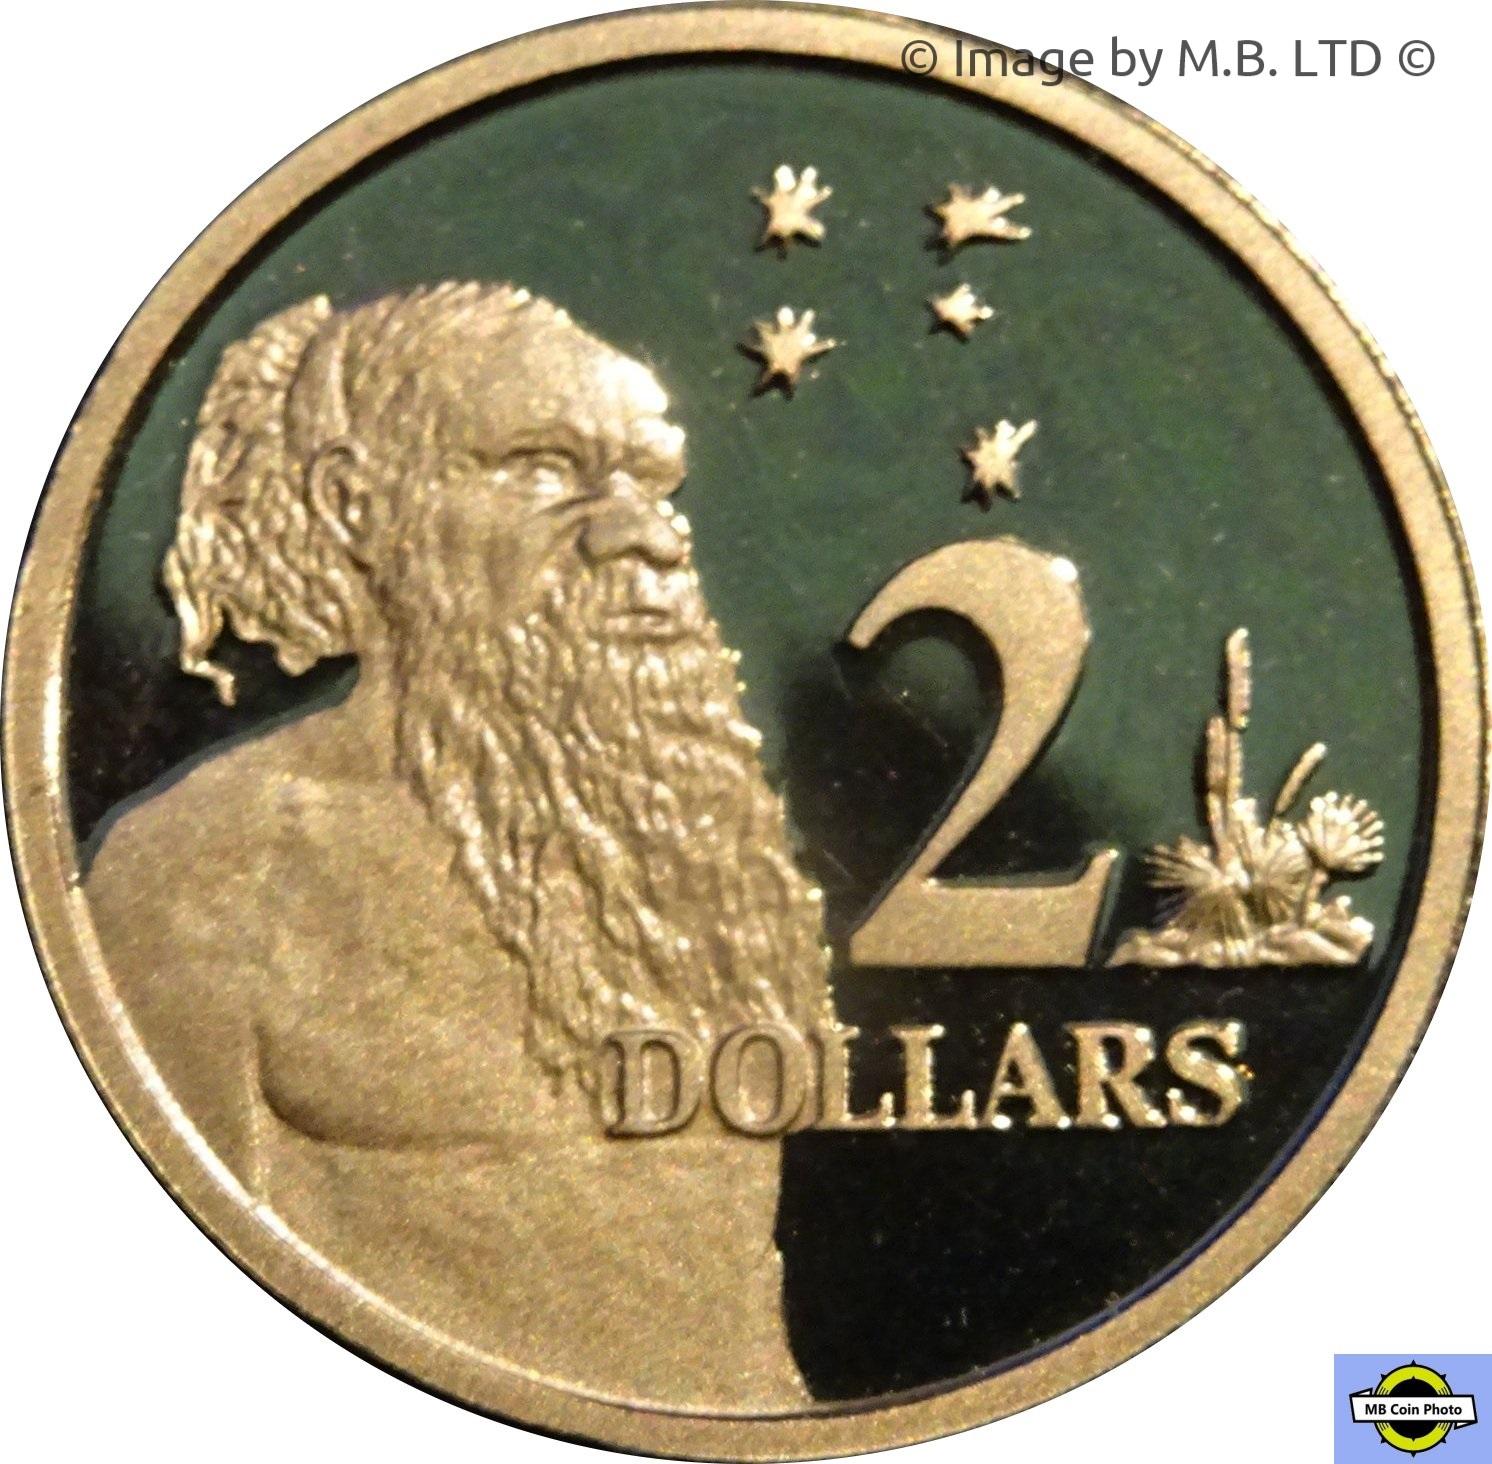 Australia 2000 $2 Aborigine /& Southern Cross Proof!